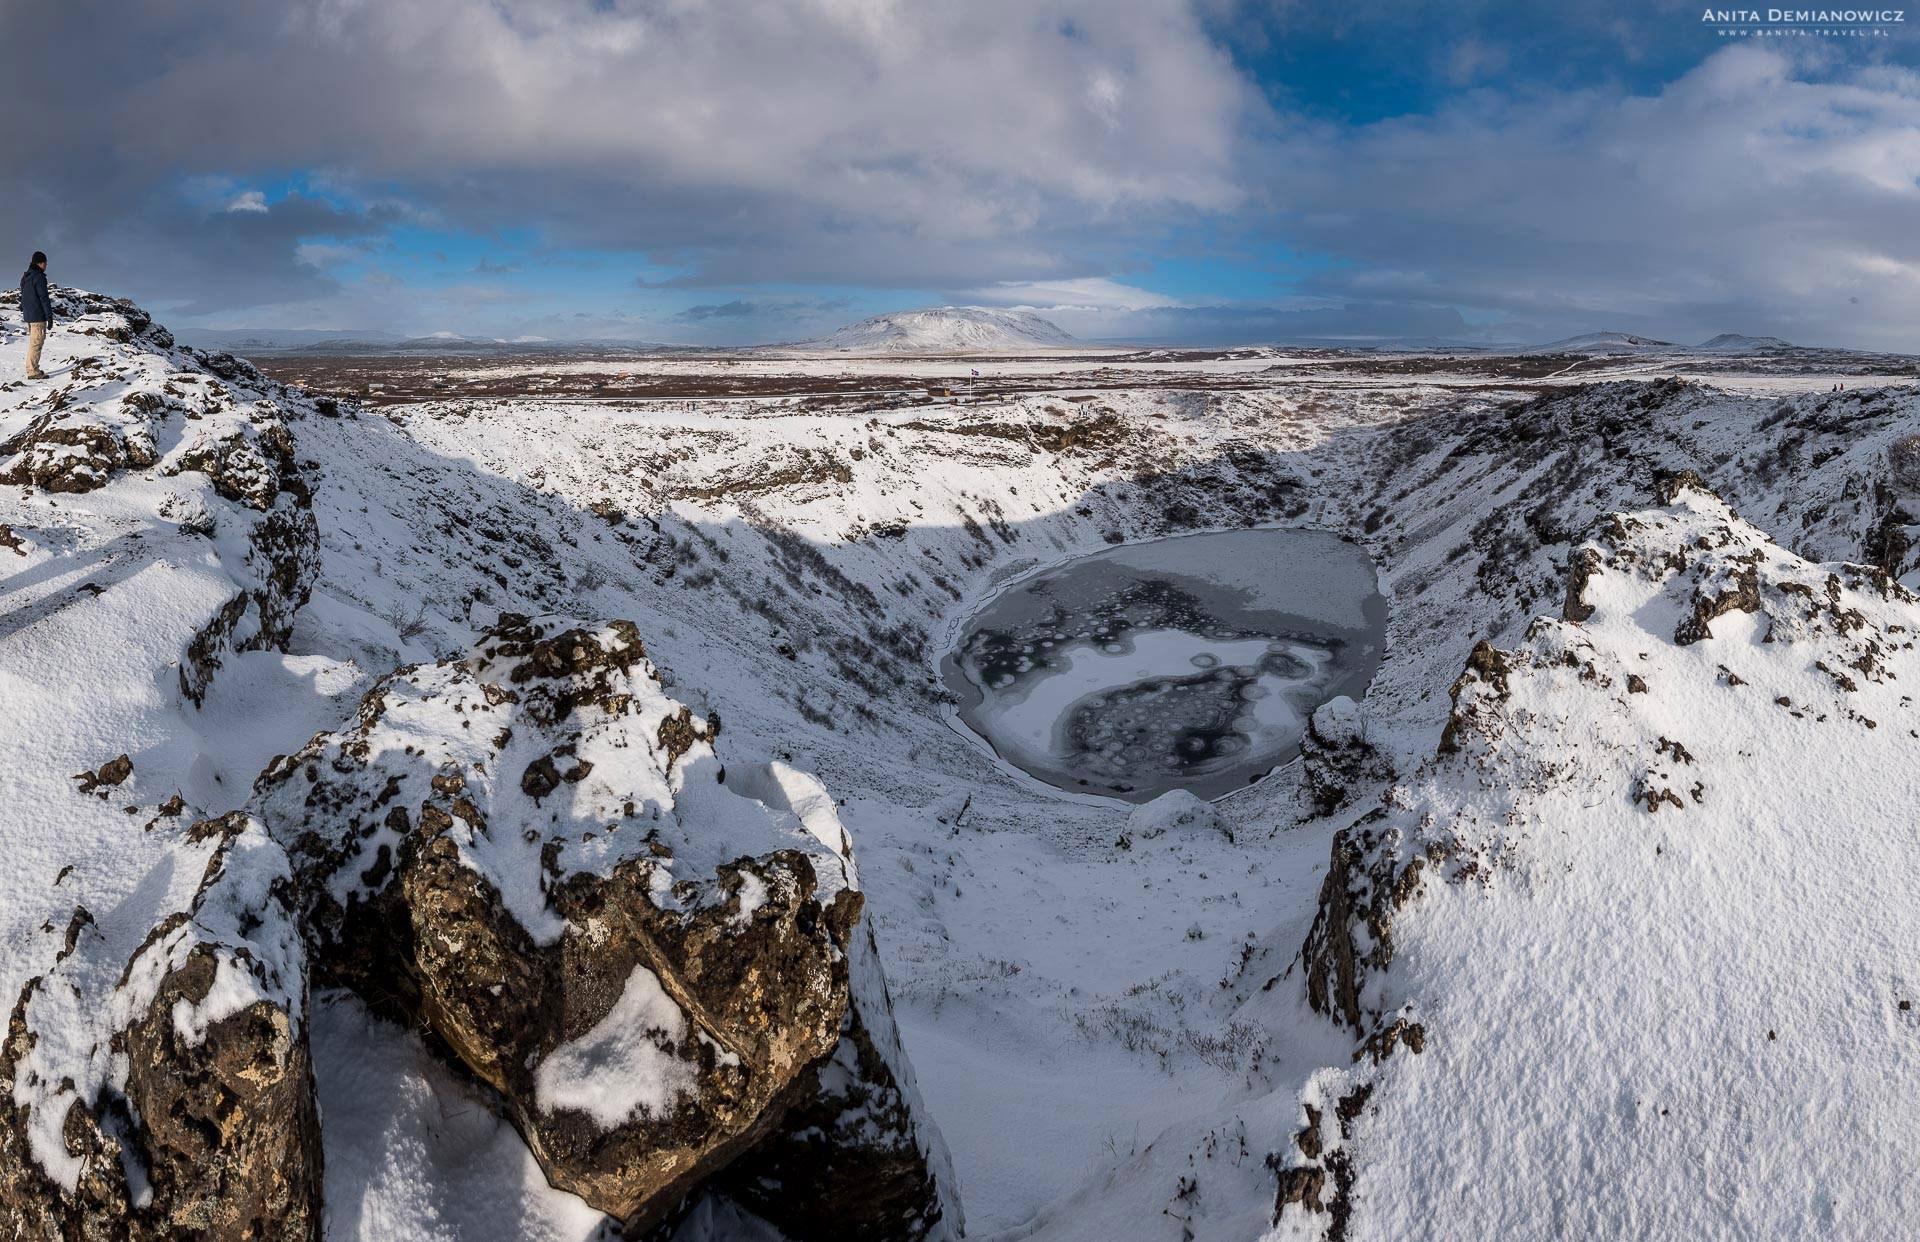 Krater Kerid, Islandia, Anita Demianowicz